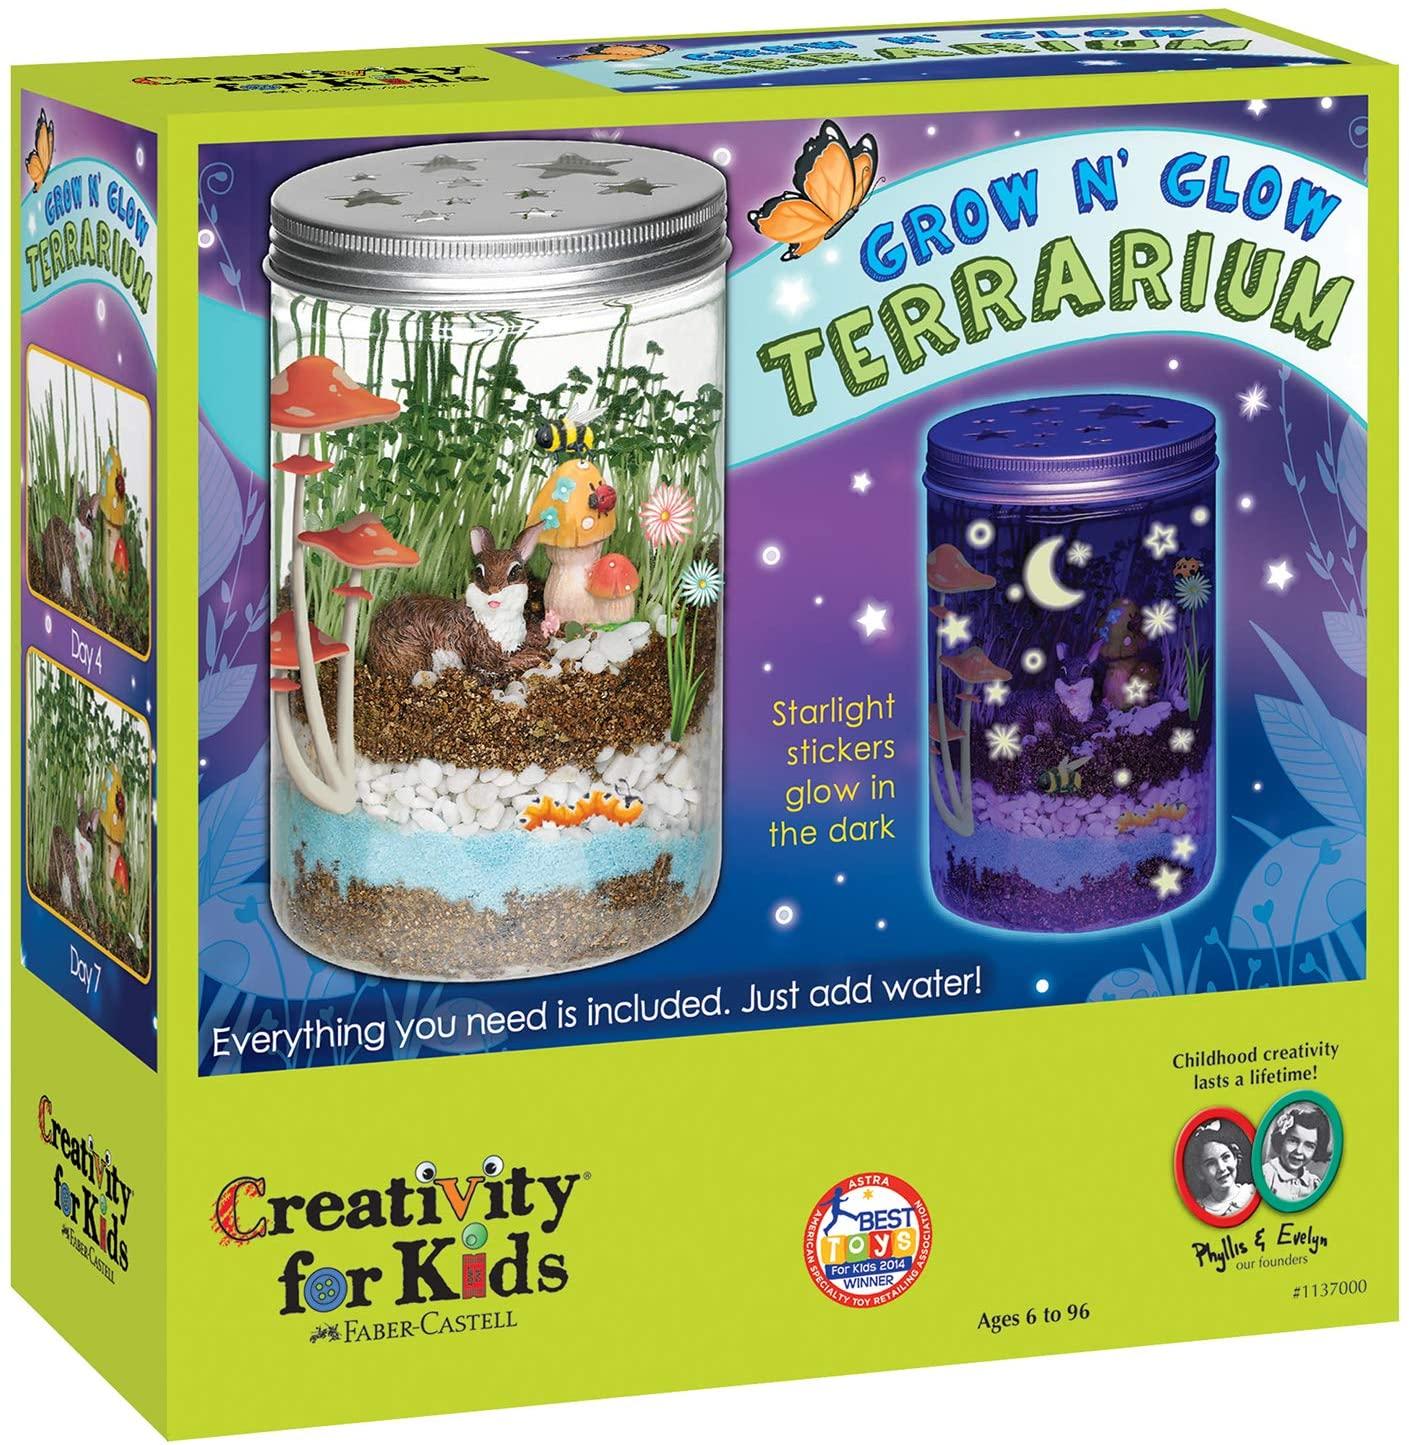 gifts-for-6-year-old-boys-terraruim